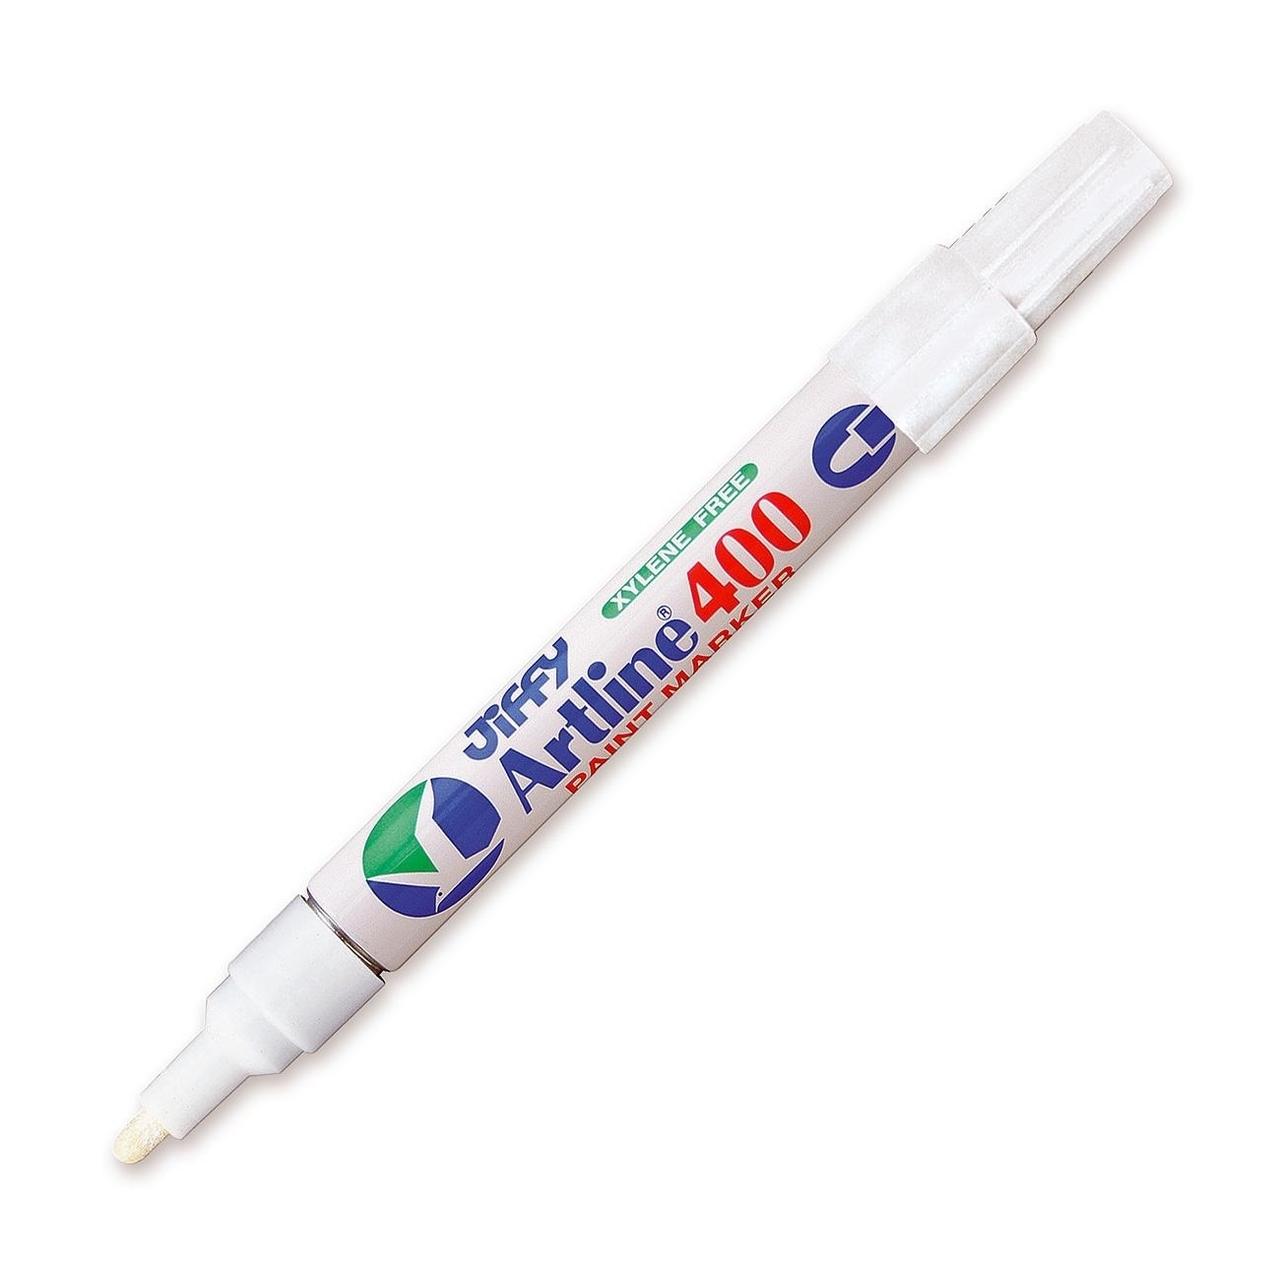 Jiffy Markers - Artline - White